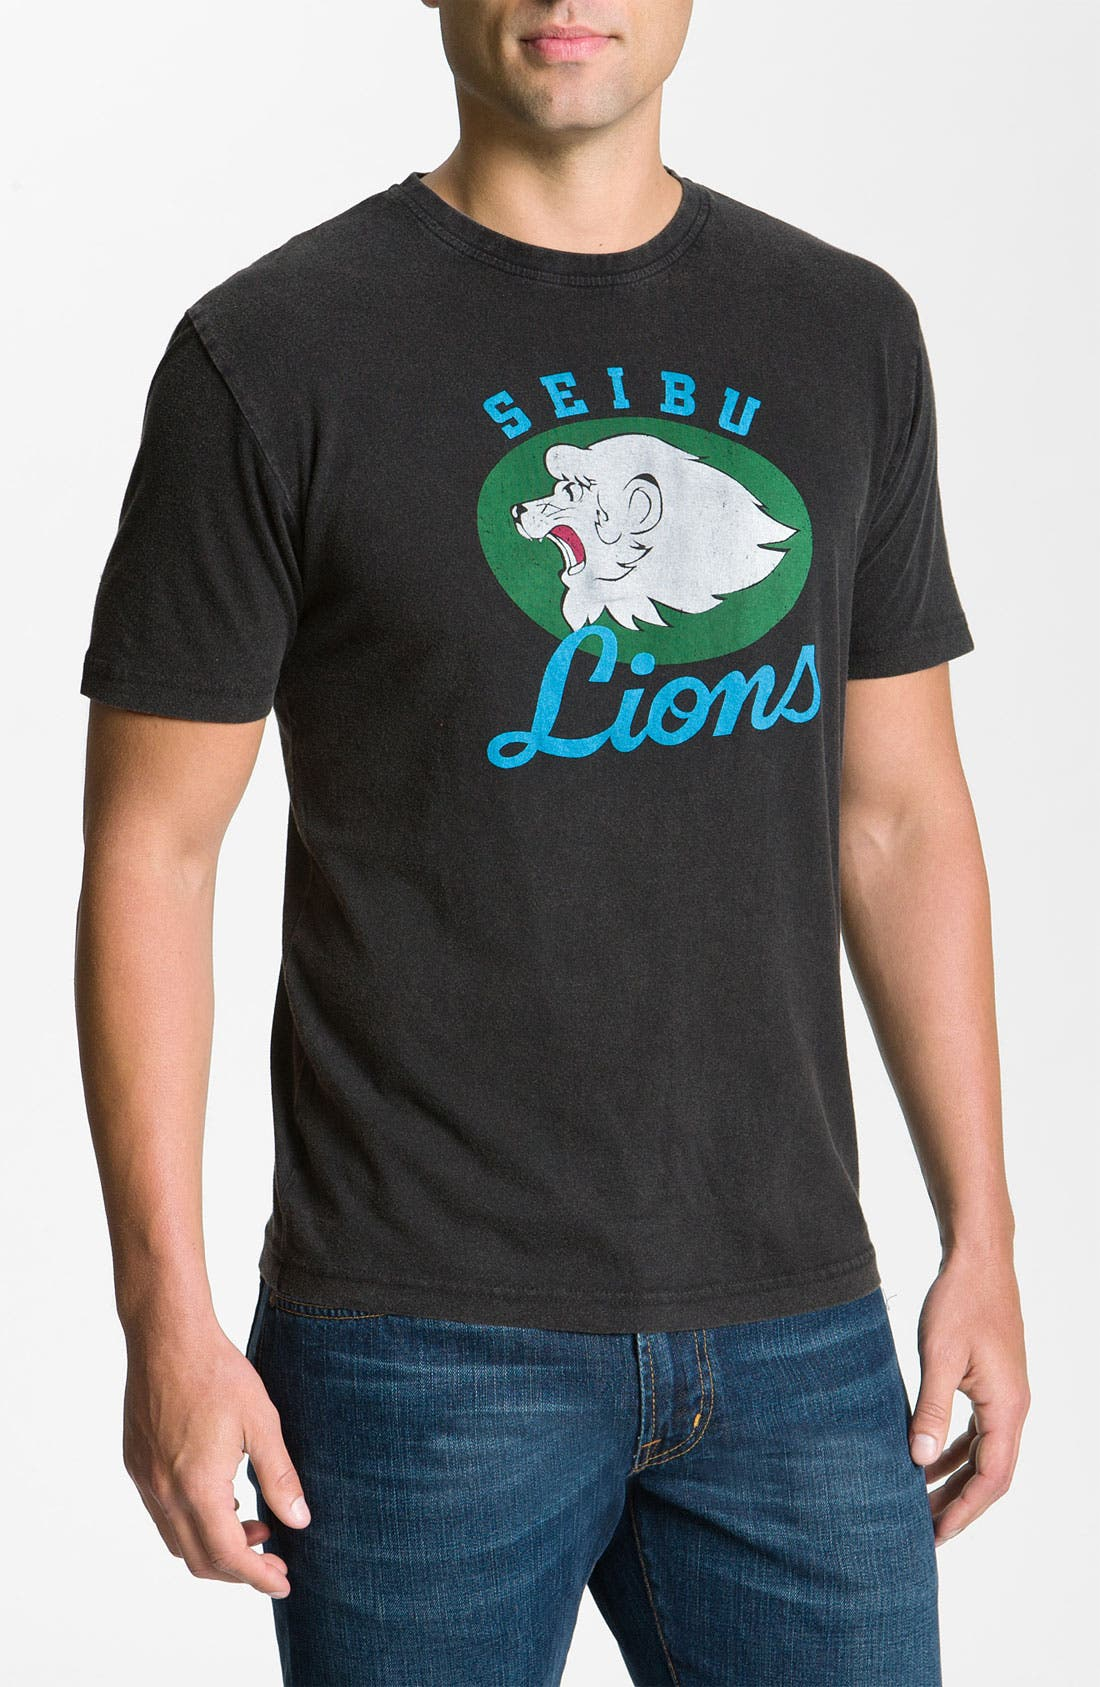 Main Image - Red Jacket 'Saitama Seibu Lions' Regular Fit Crewneck T-Shirt (Men)